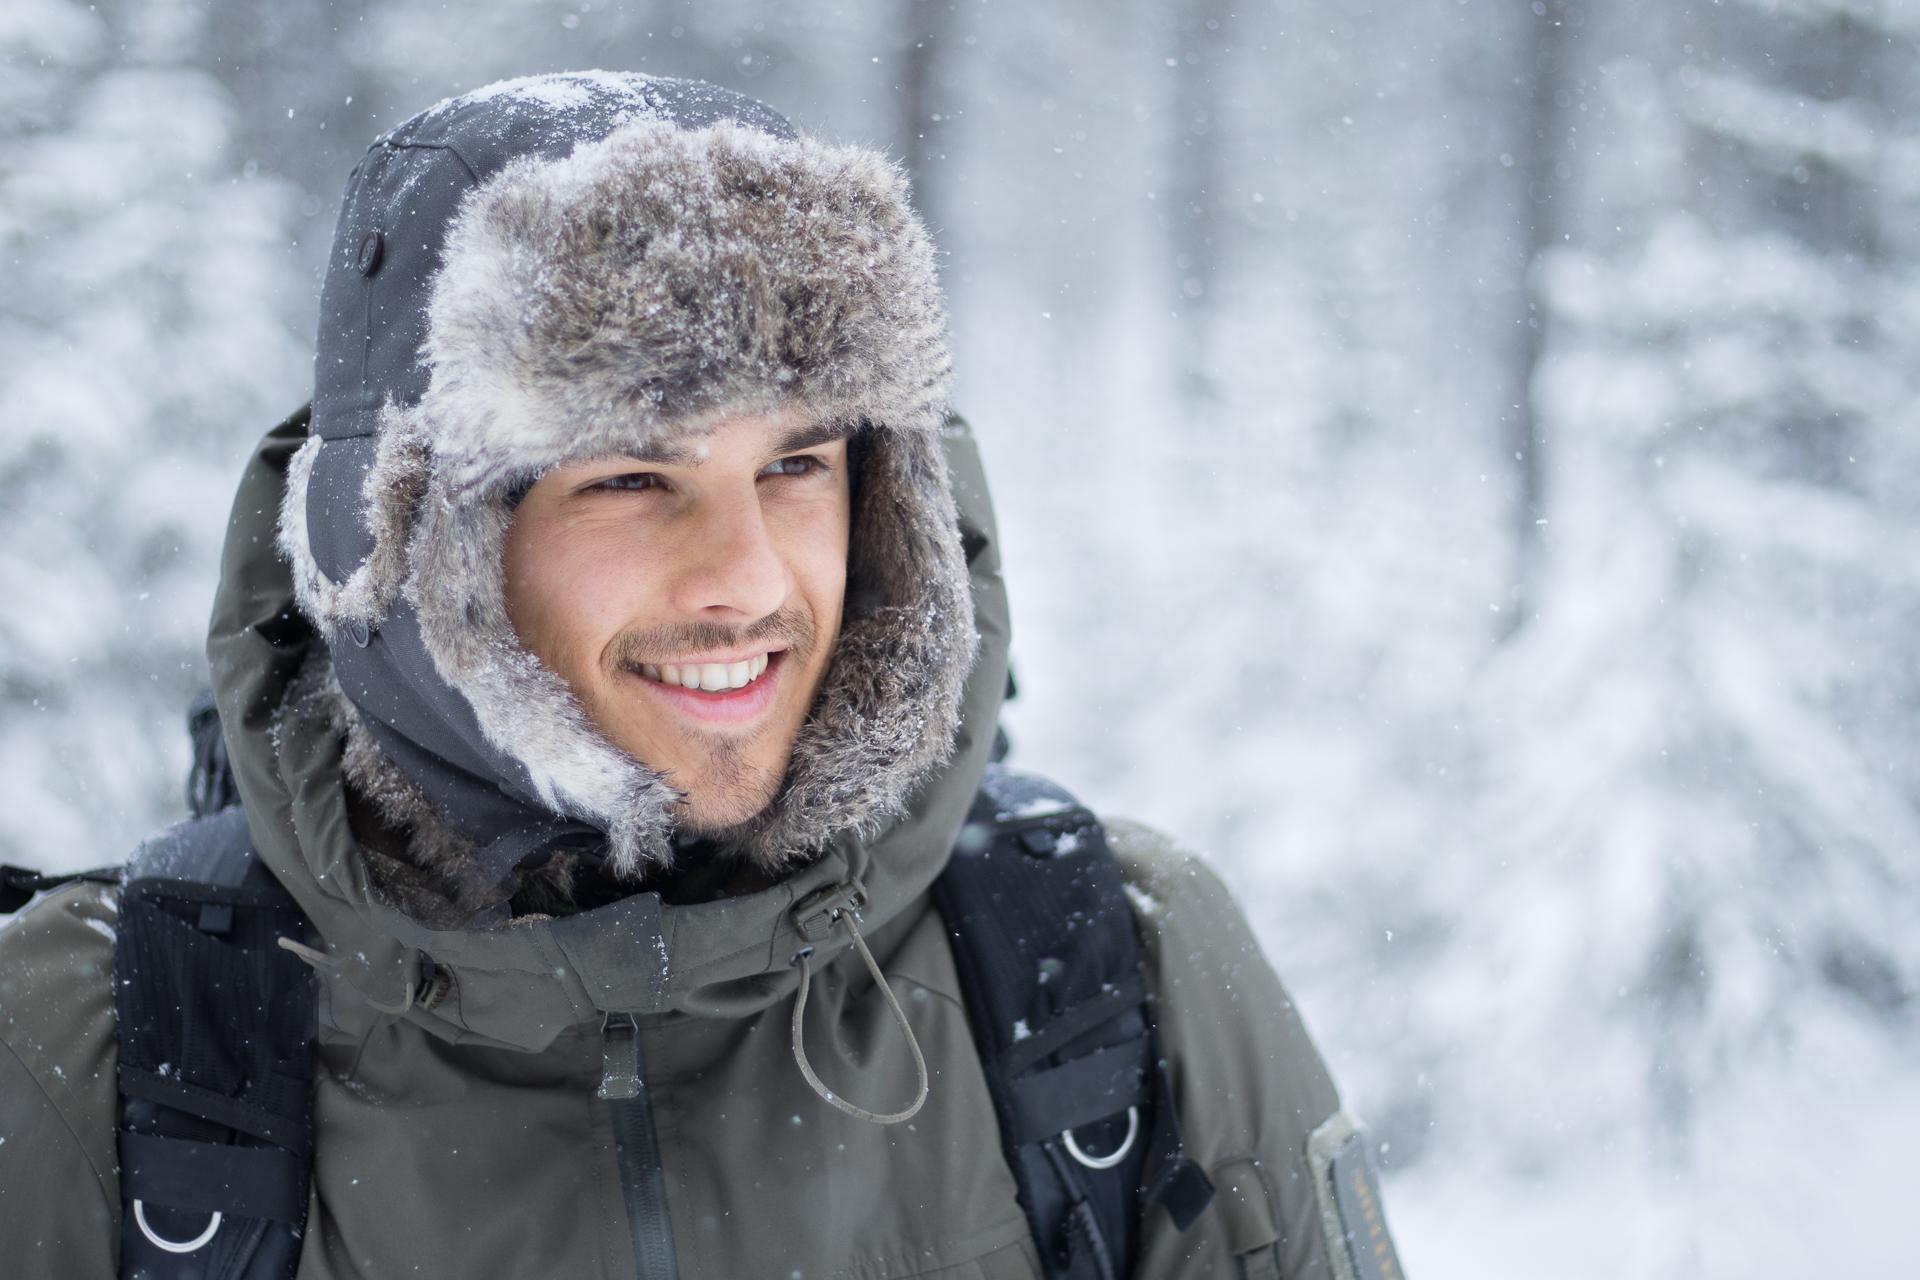 46. Bohnensack – Chris Kaula: Naturfotografie Liebhaberei oder Job?